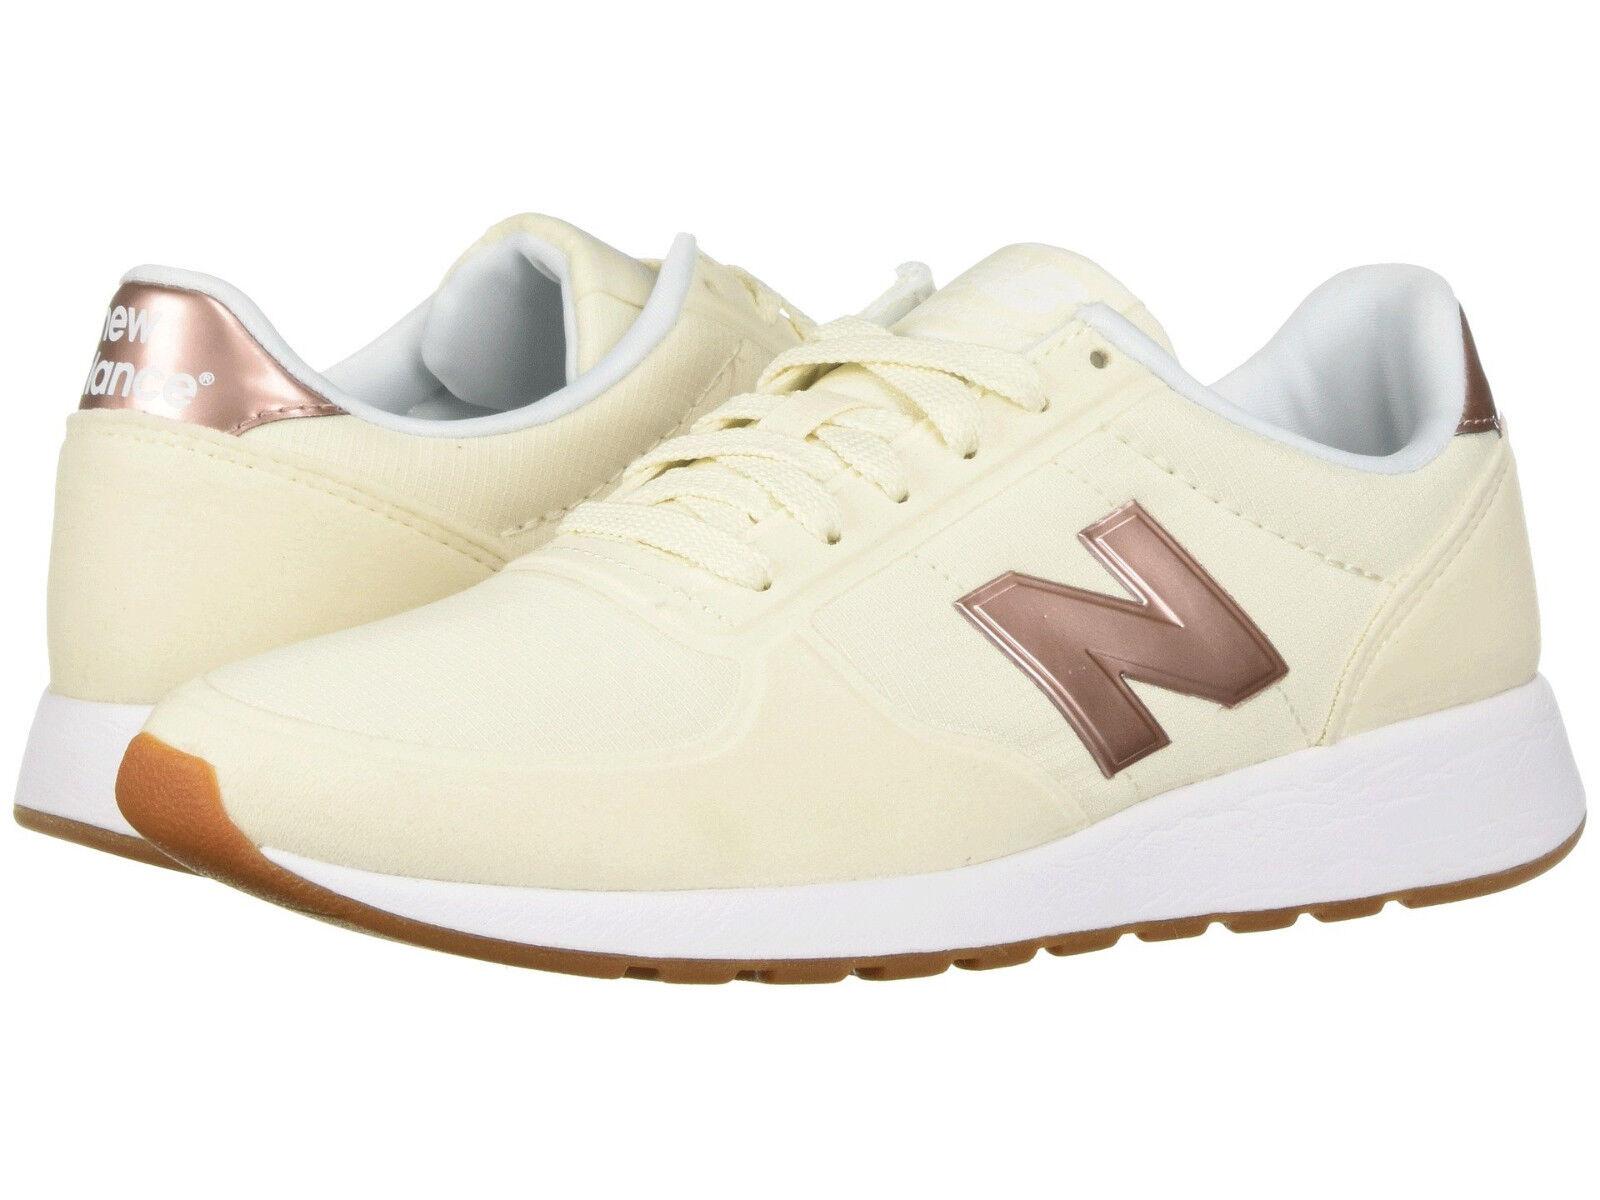 Women New Balance WS215AG Sneaker Shoes Medium (B) Angora White 100%Original New